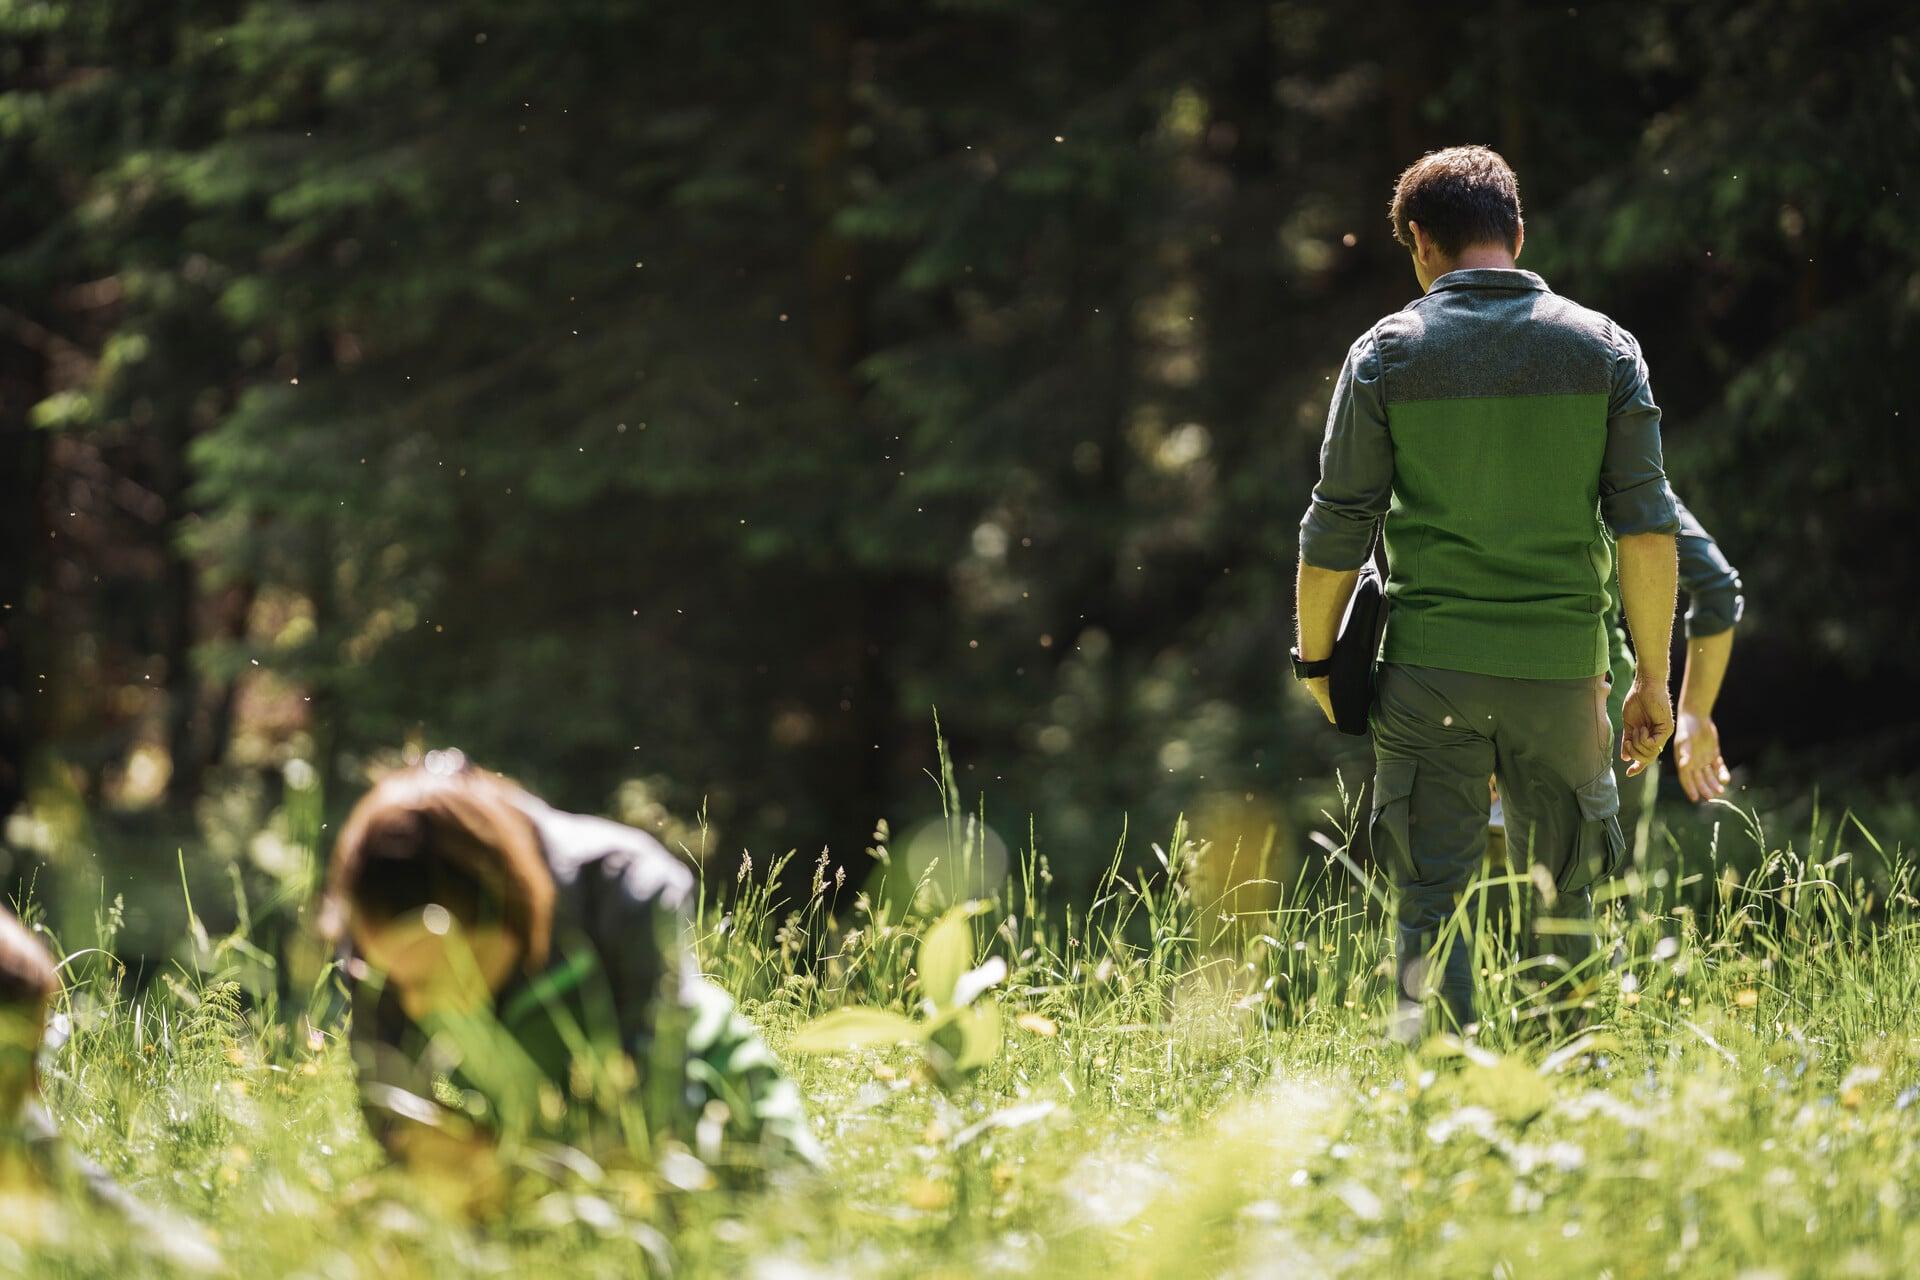 013_Nationalpark_Gesäuse_Naturschutz_Ranger©StefanLeitner_NPG